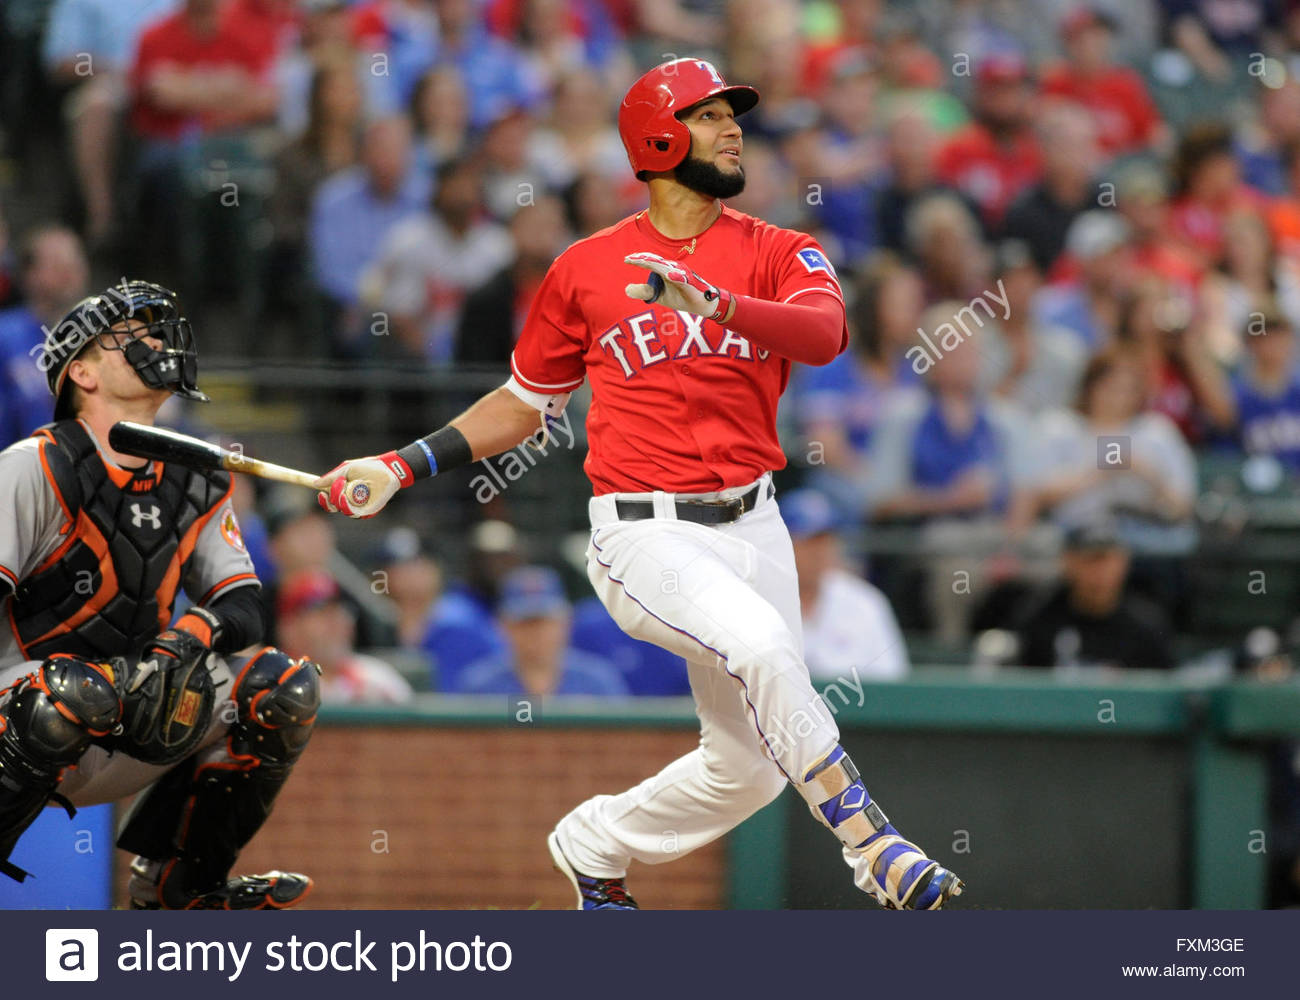 apr-16-2016-texas-rangers-right-fielder-nomar-mazara-30-during-an-FXM3GE